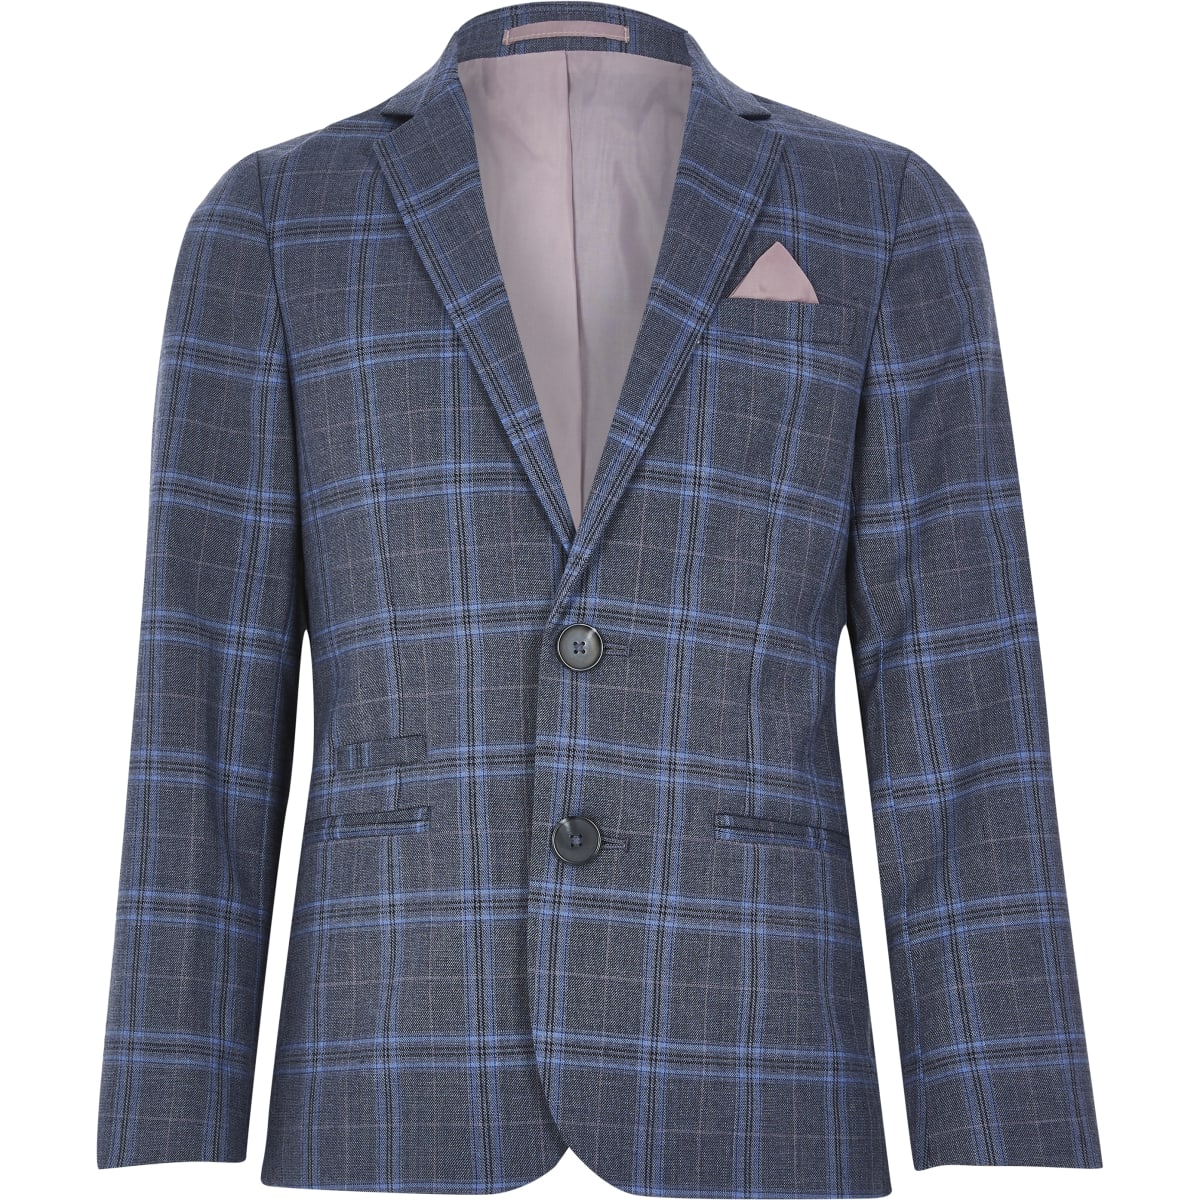 Boys blue check suit blazer